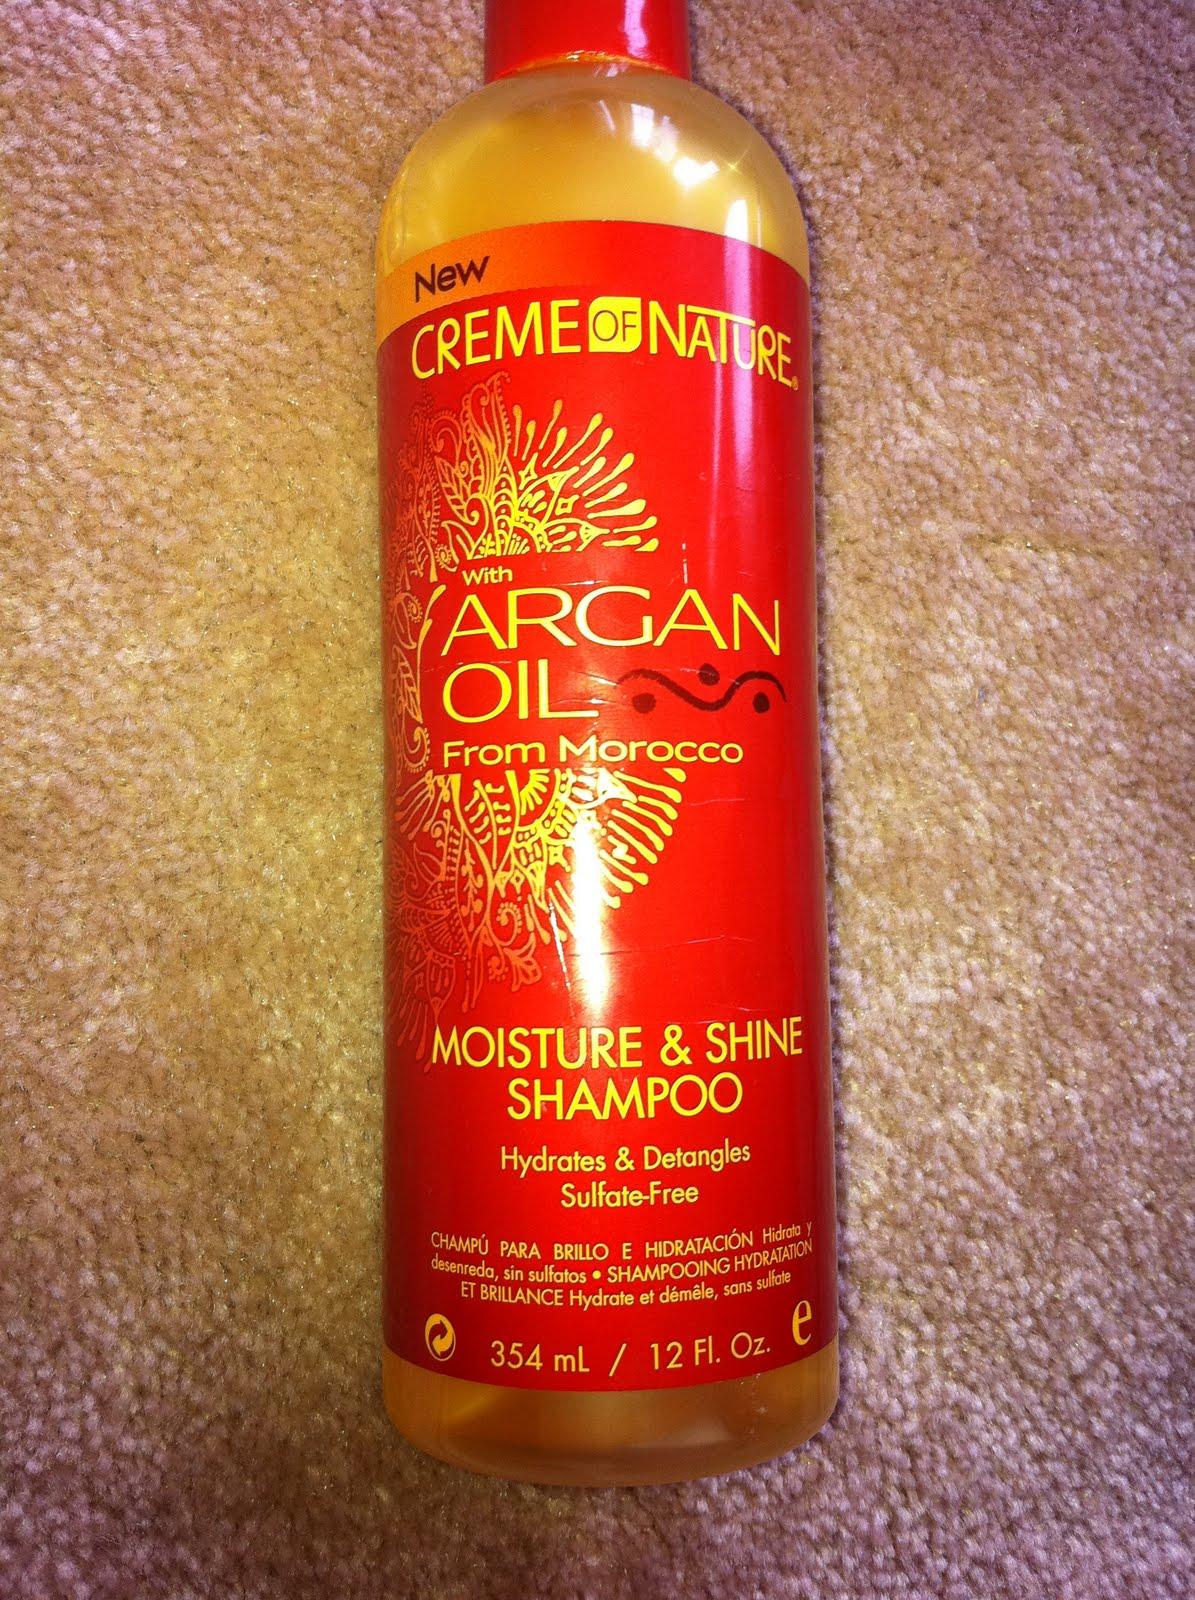 Creme Of Nature Argan Oil Shampoo Review Natural Hair